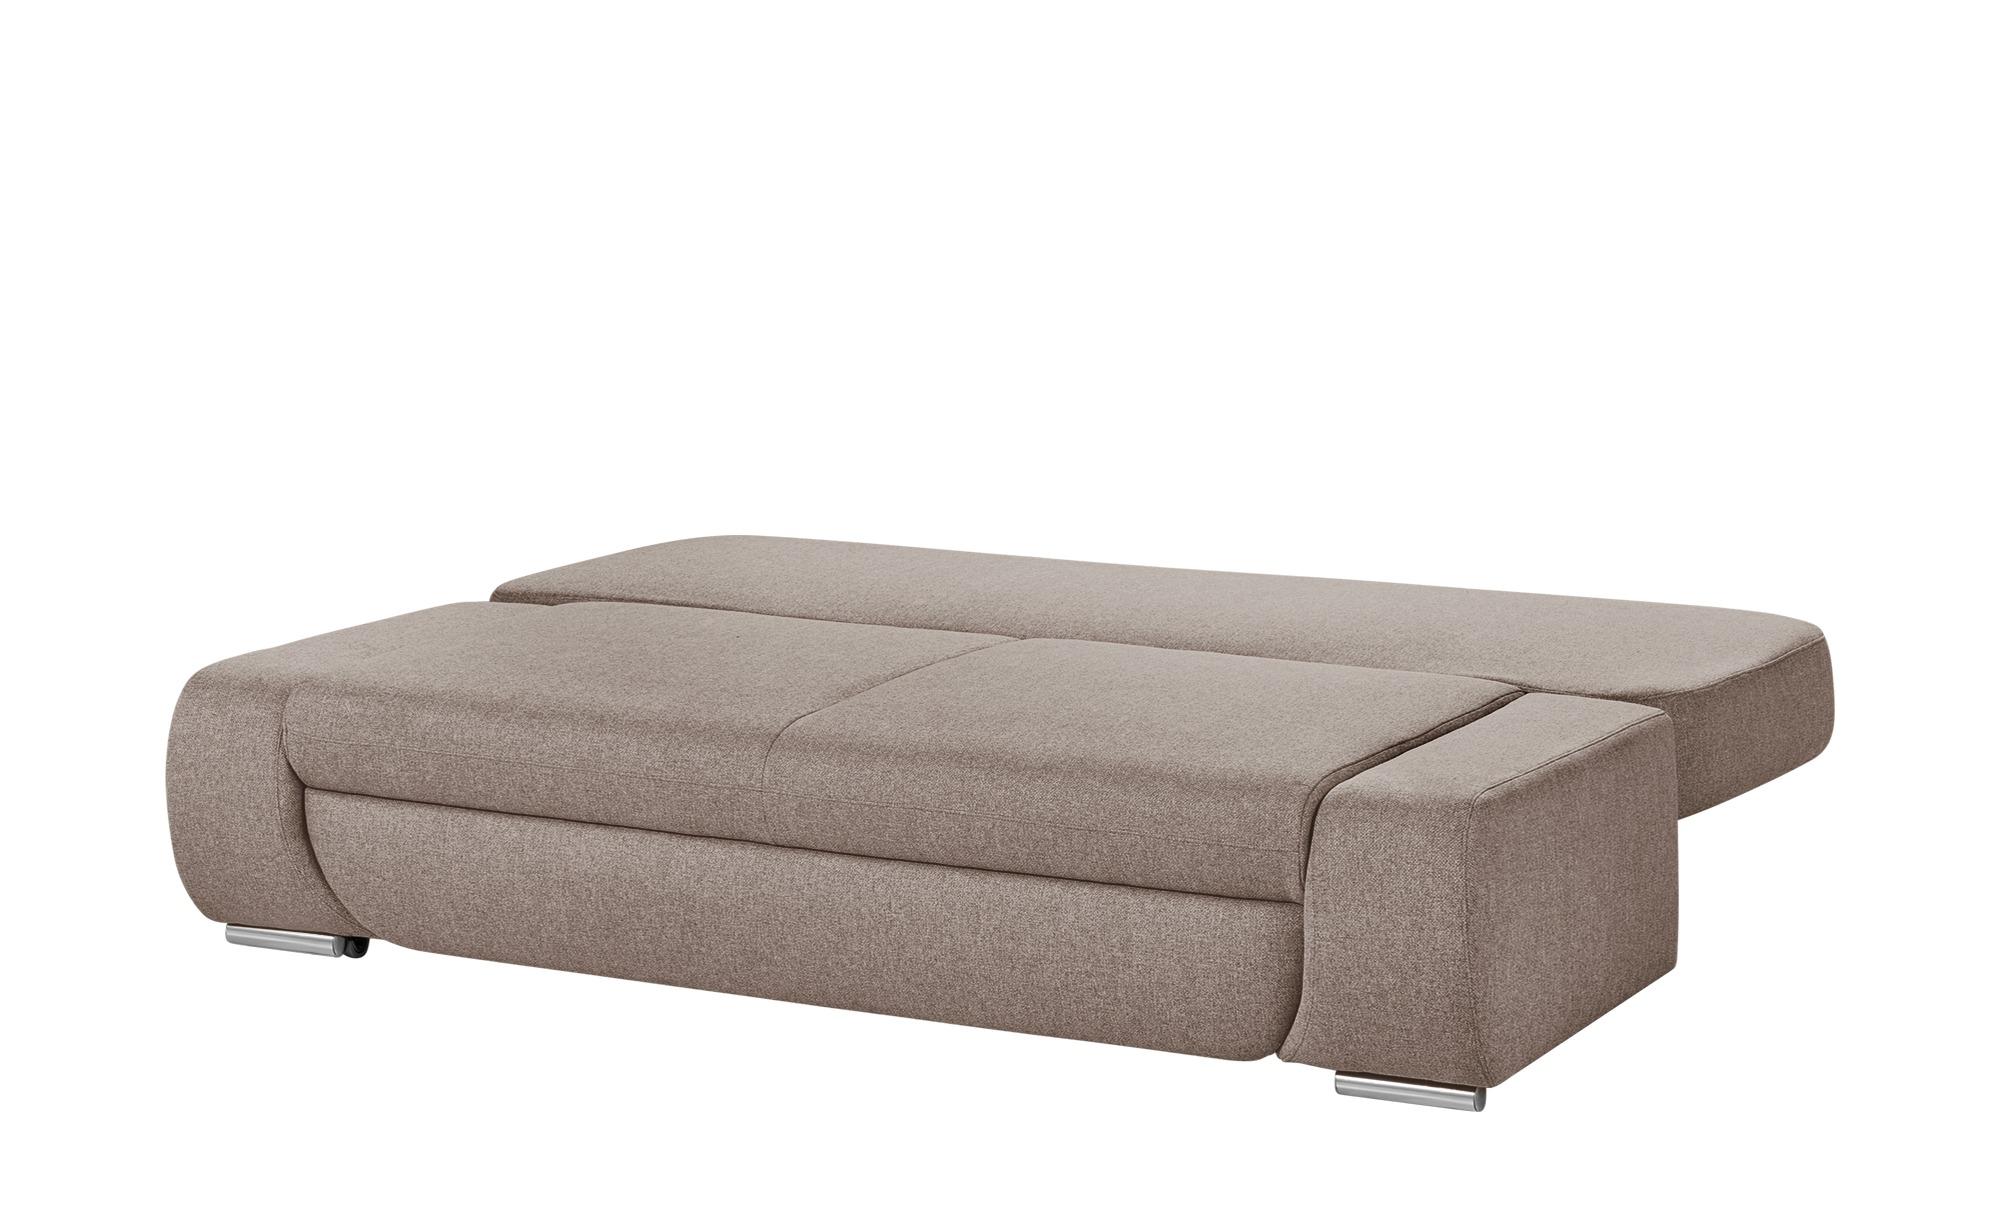 smart Schlafsofa braun - Webstoff Bonita ¦ braun ¦ Maße (cm): B: 210 H: 87 T: 100 Polstermöbel > Sofas > 2-Sitzer - Höffner